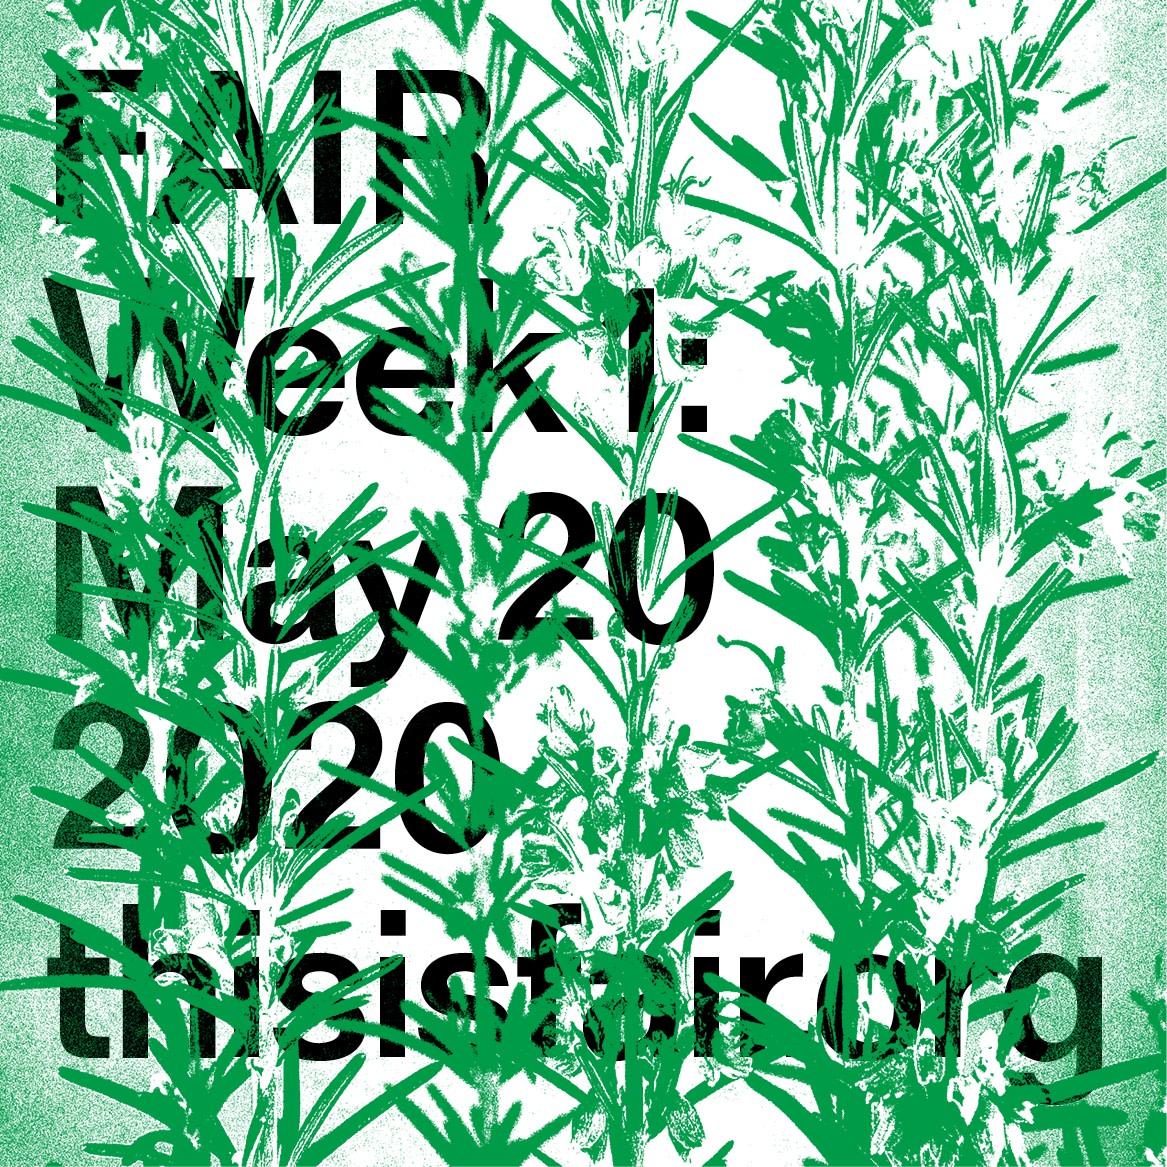 FAIR Week 1: May 20, 2020